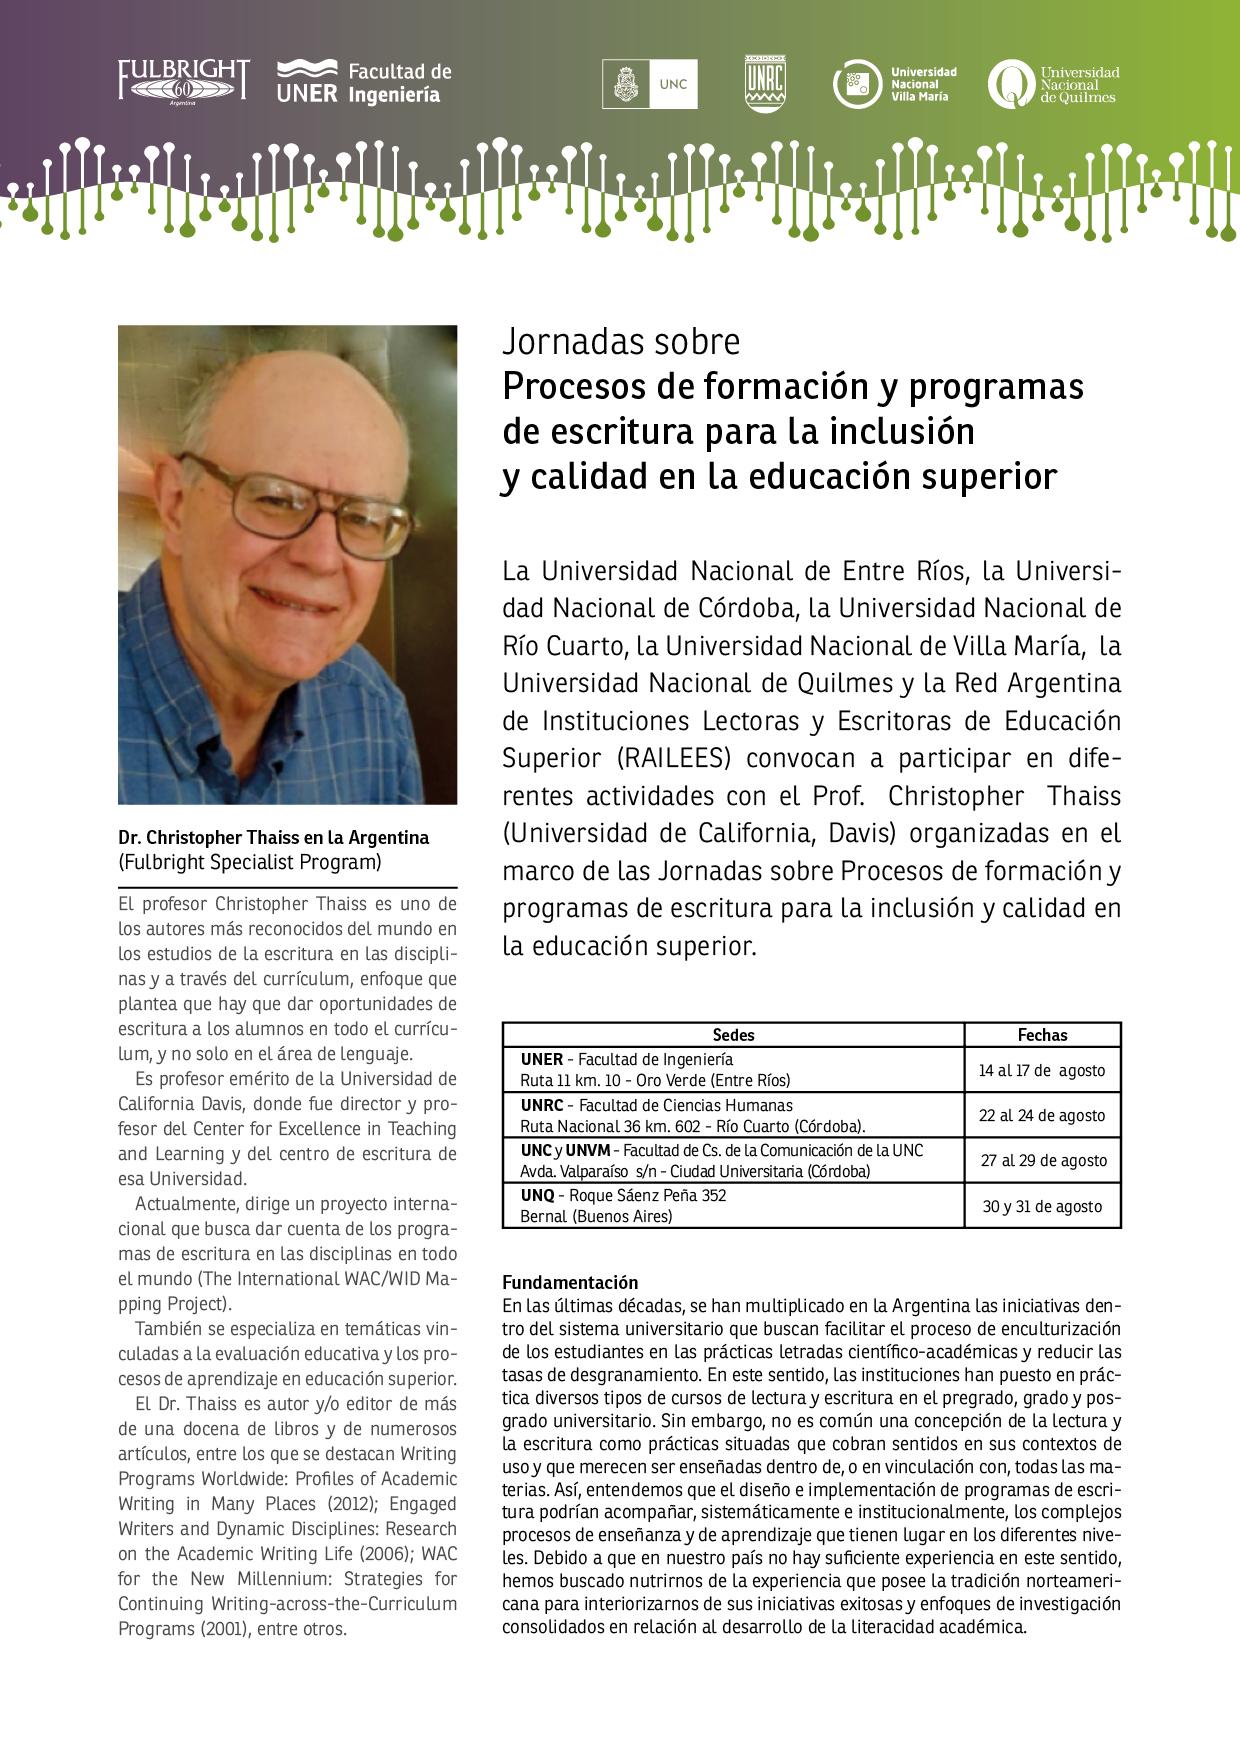 Chris Thaiss en Argentina: escribiendo a través del currículum ...